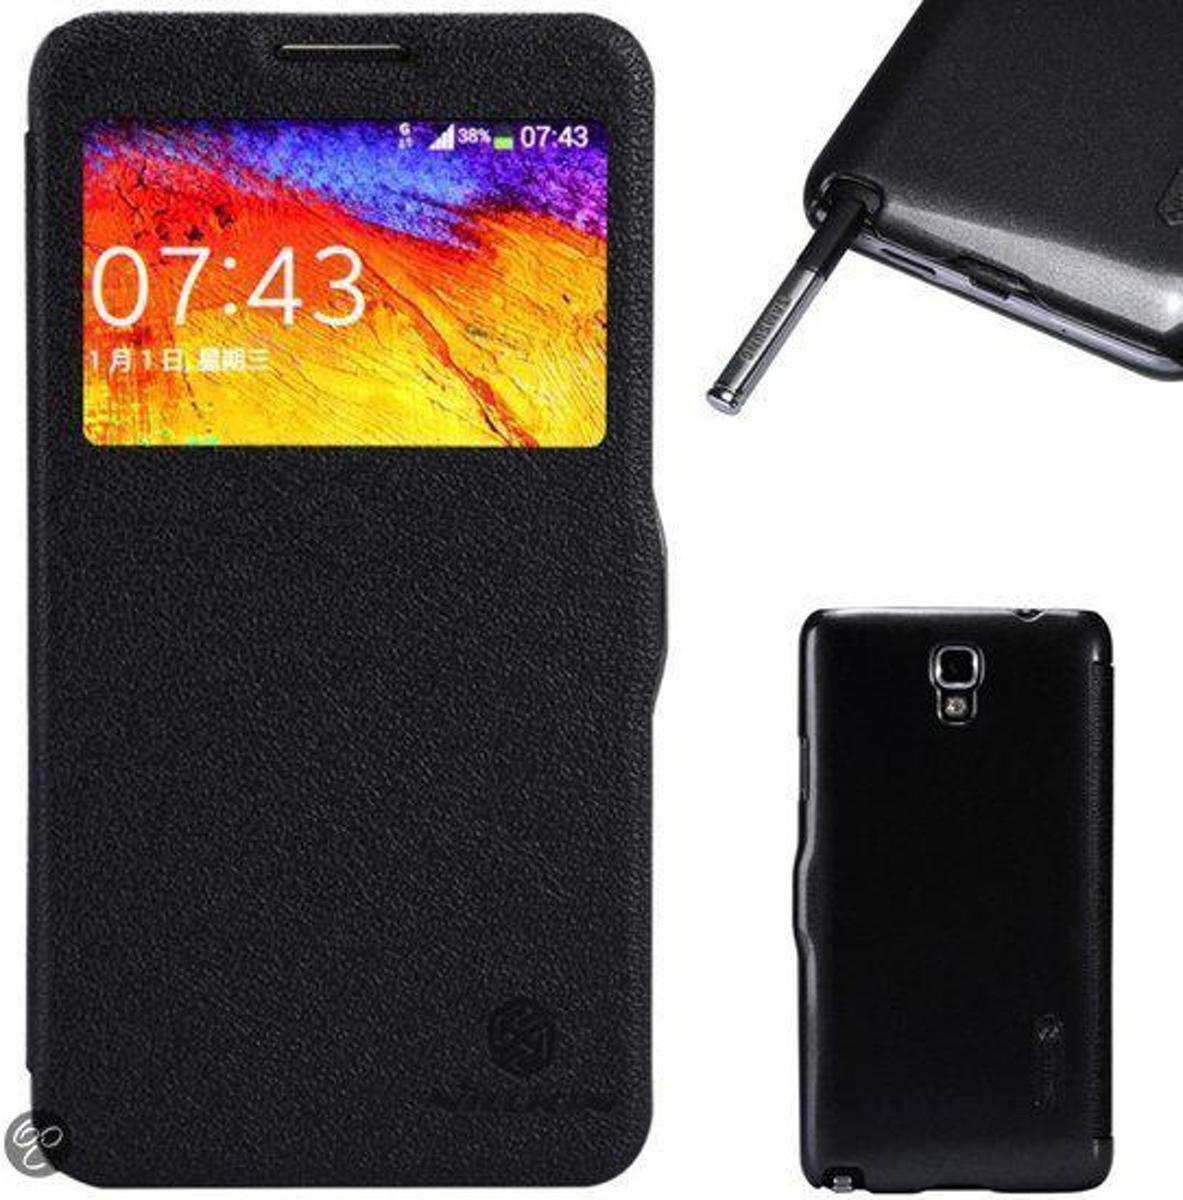 Nillkin New Leather Case Voor Samsung Galaxy Note 3 Neo Baseus Terse 5 Flip Cover Window View N750 N7505 Zwart